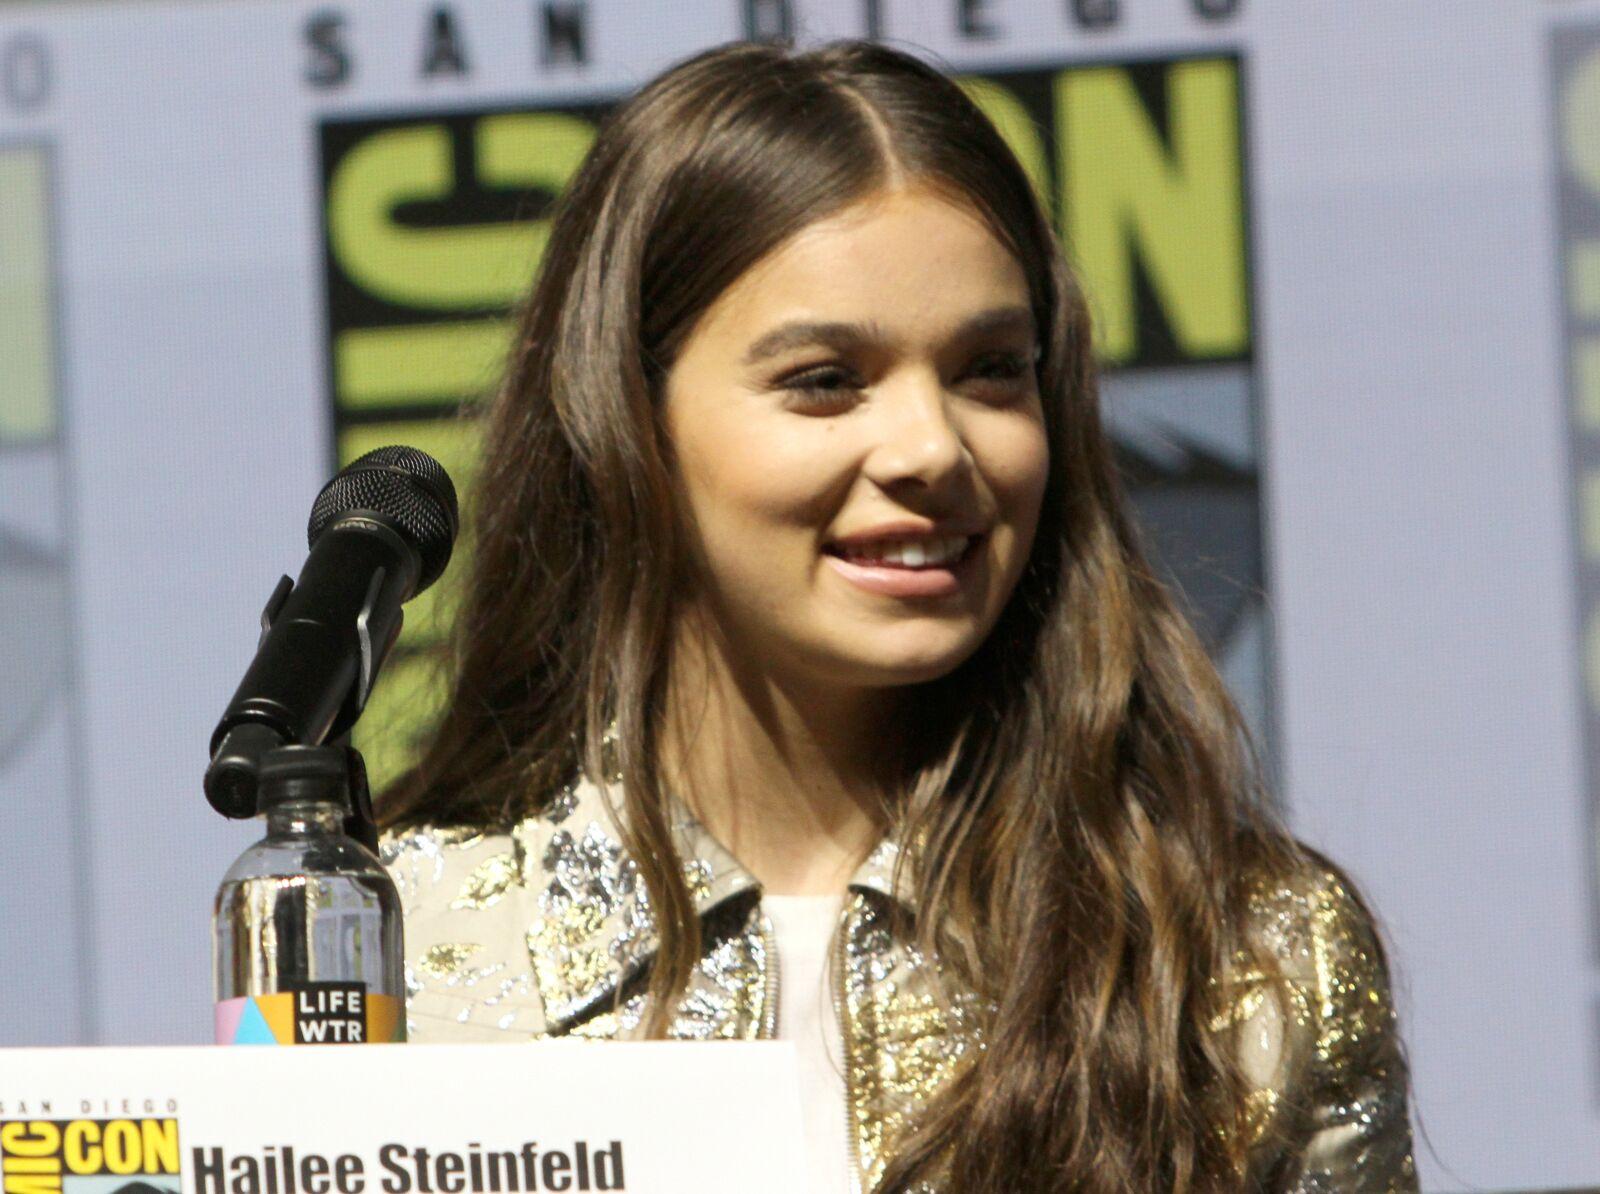 Hawkeye: Has the Disney Plus show found its Kate Bishop in Hailee Steinfeld?